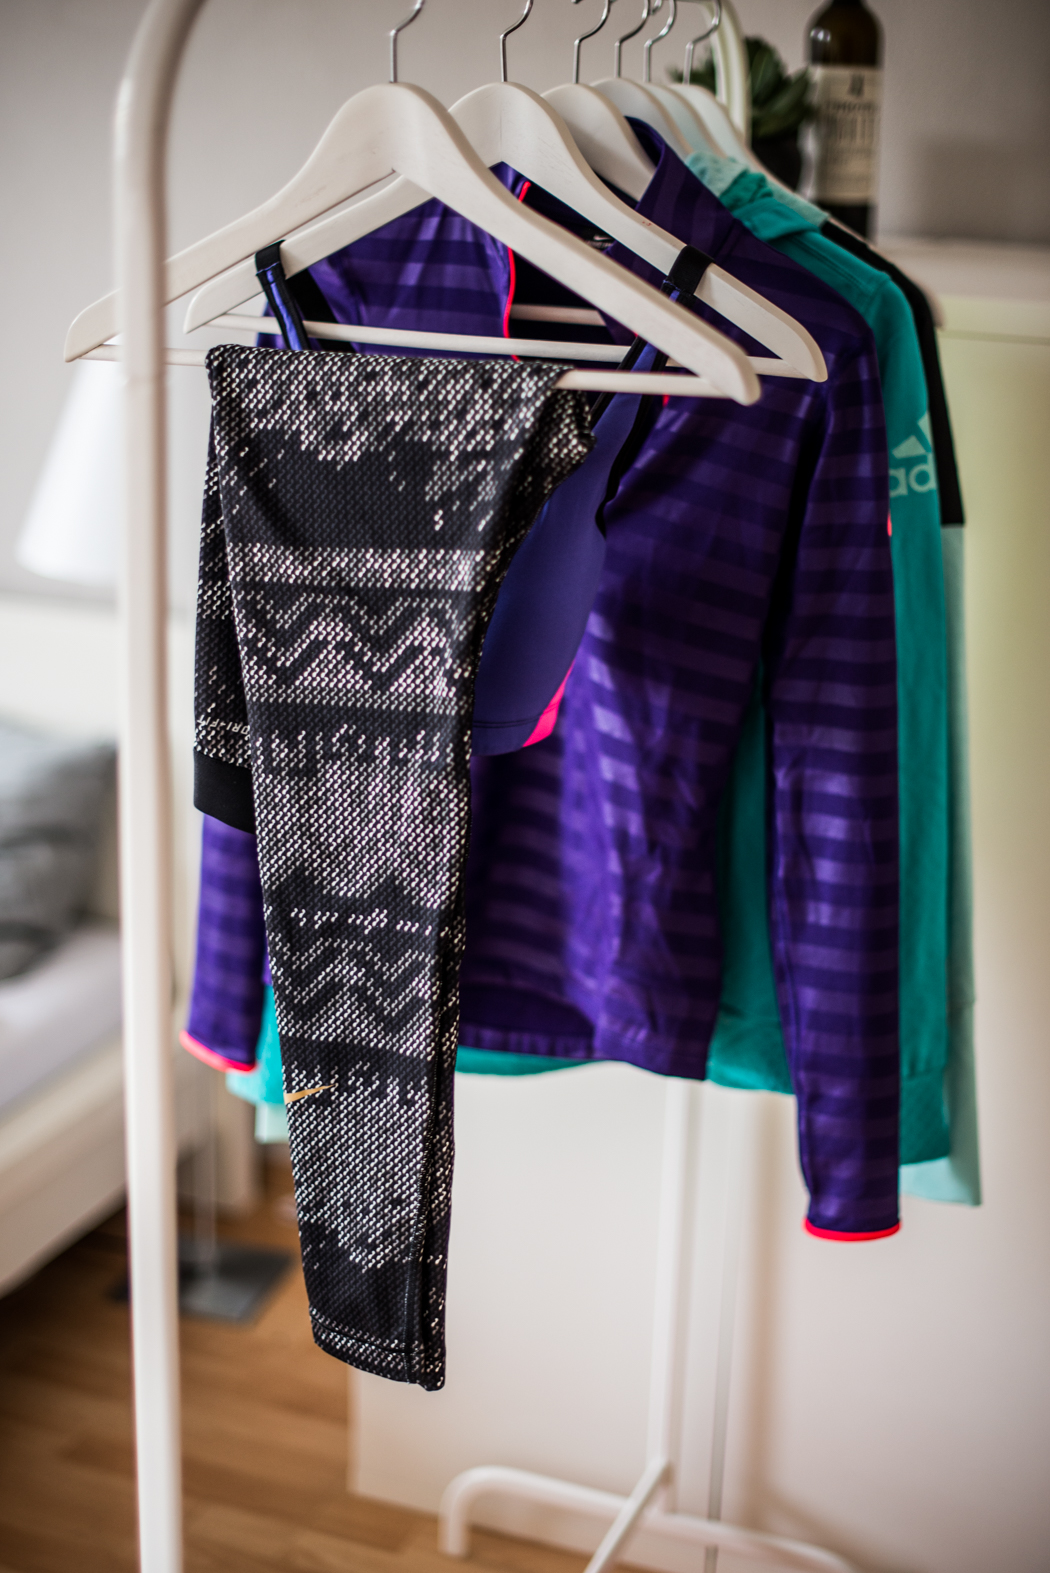 Shoppinghaul-Lindarella-Sport-Nike-Adidas-1